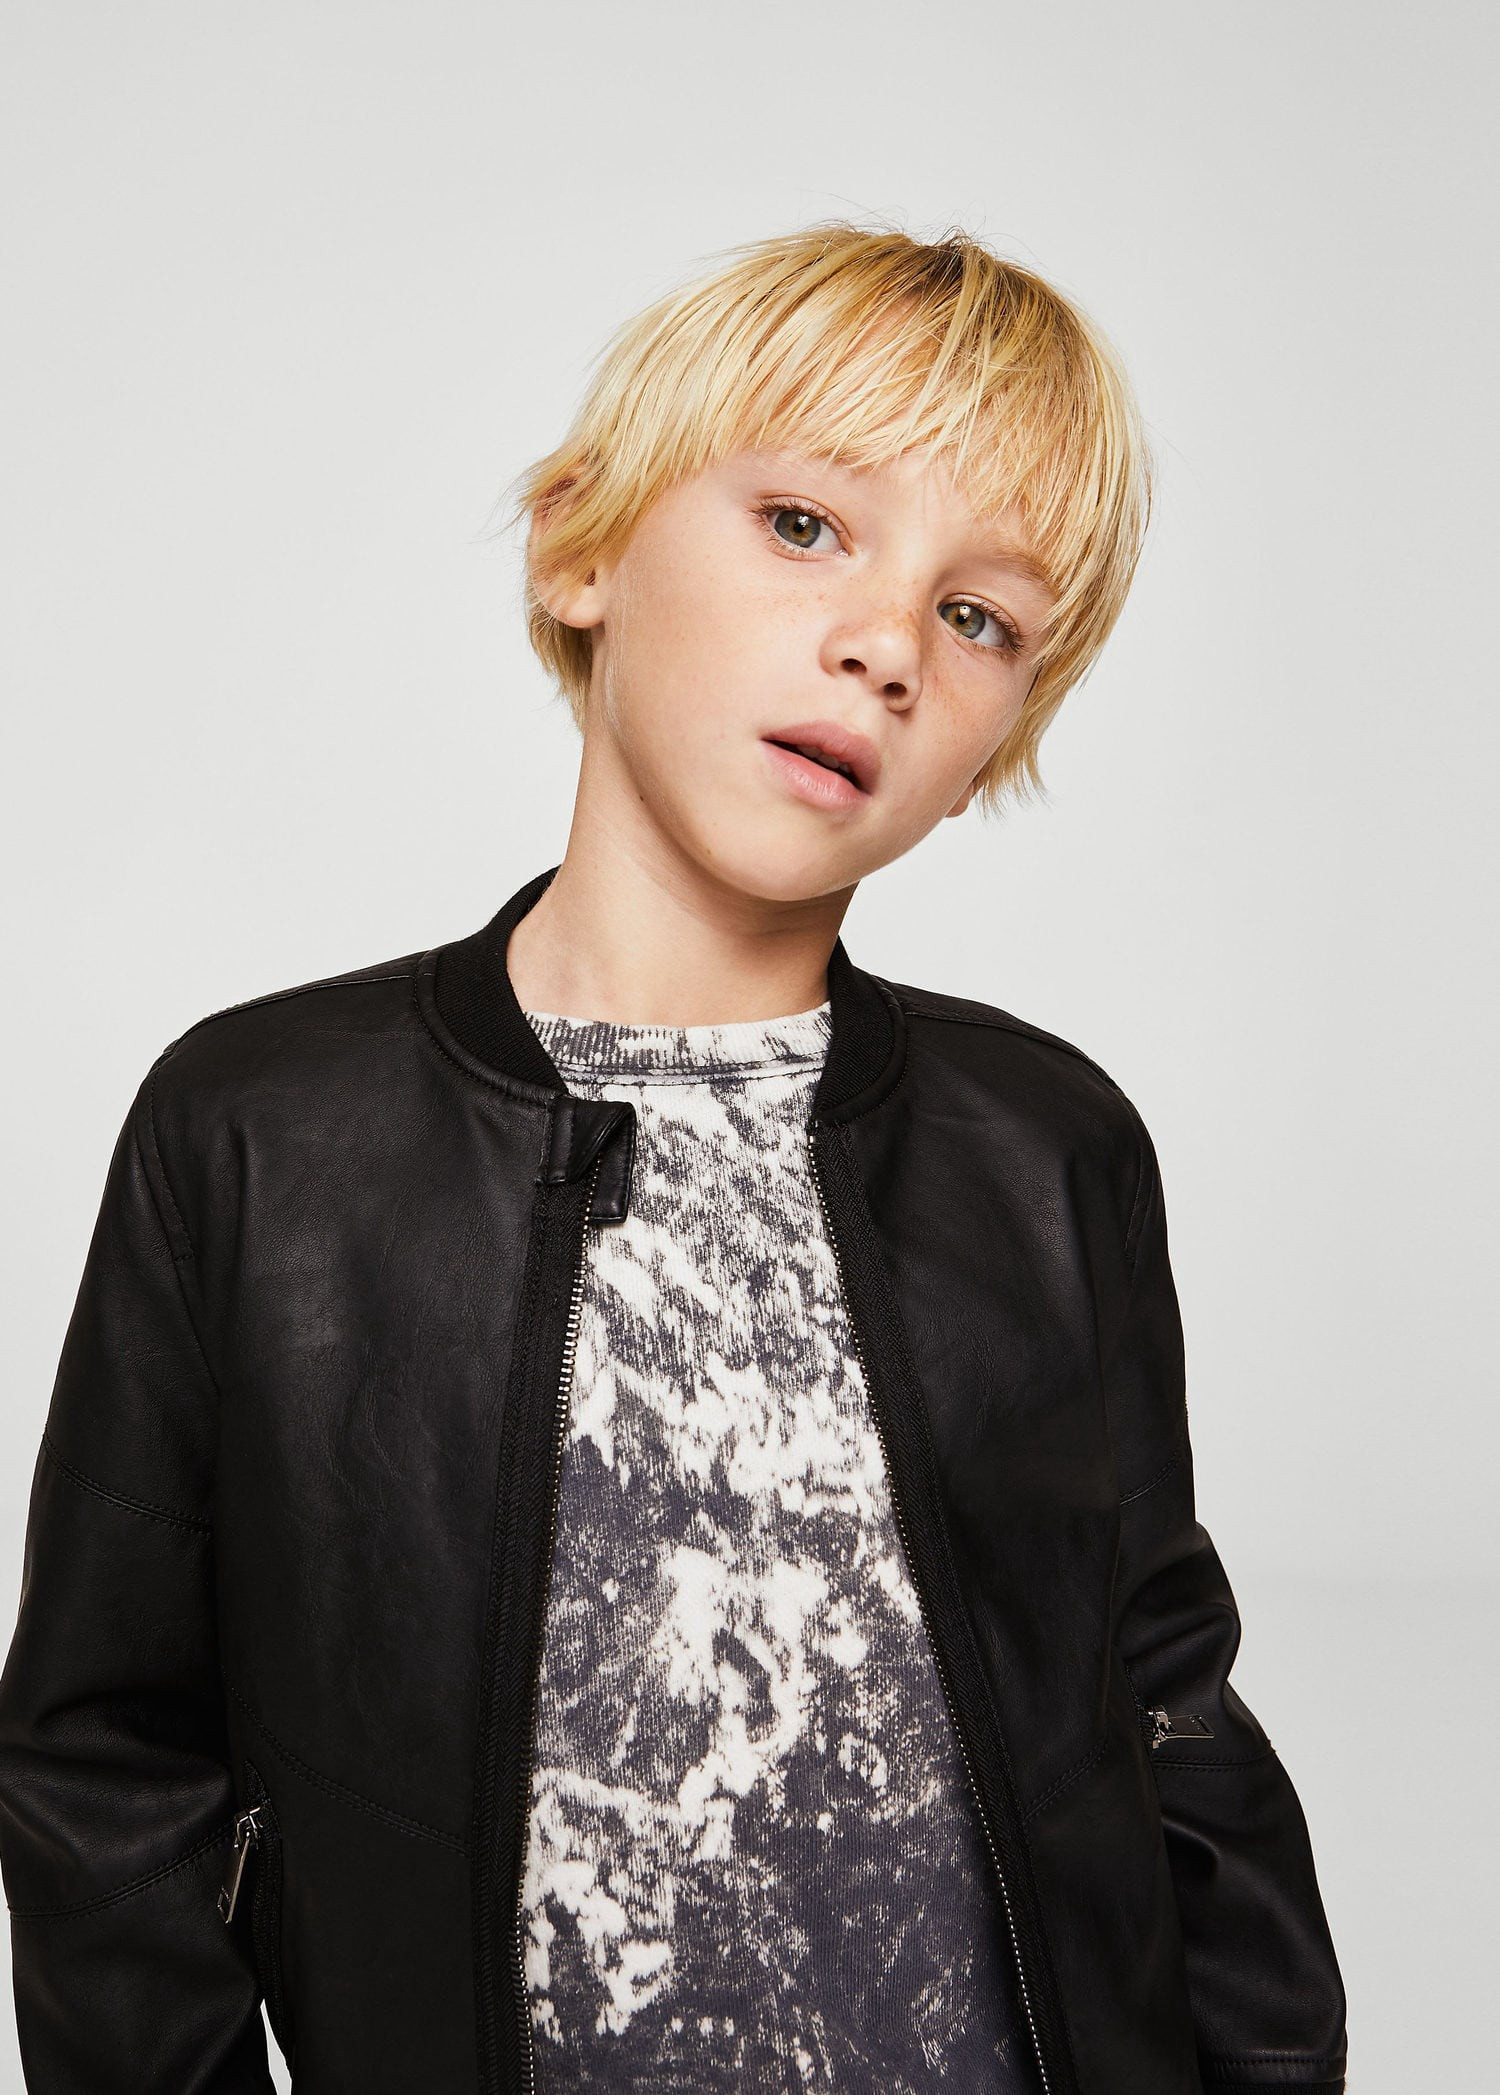 Mango Bomber Jacket Leather Effect Boys Kids 13 14 Years 164cm Boys Jacket Bomber Jacket Leather Jacket [ 2095 x 1500 Pixel ]